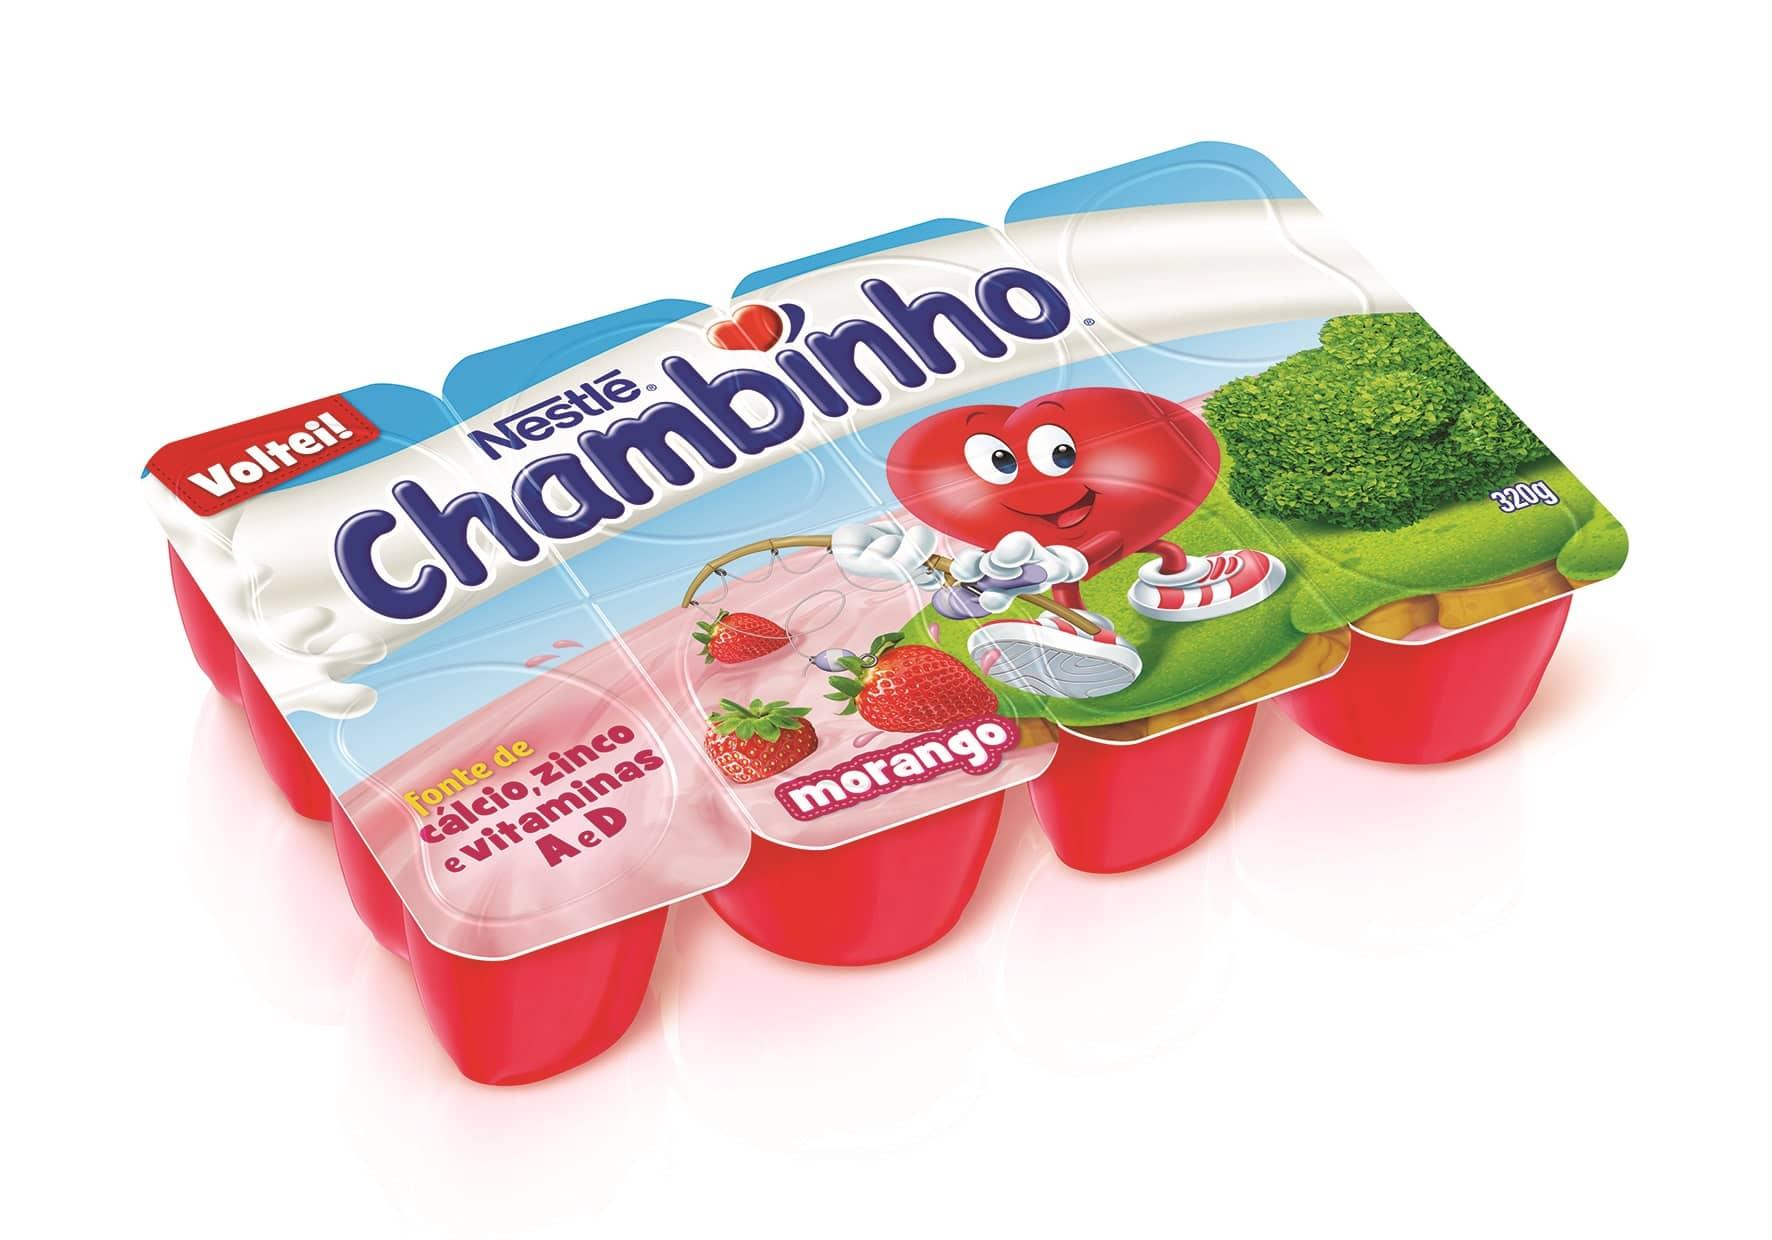 chambinho-morango-band-360g-MD-1-20140416045249489